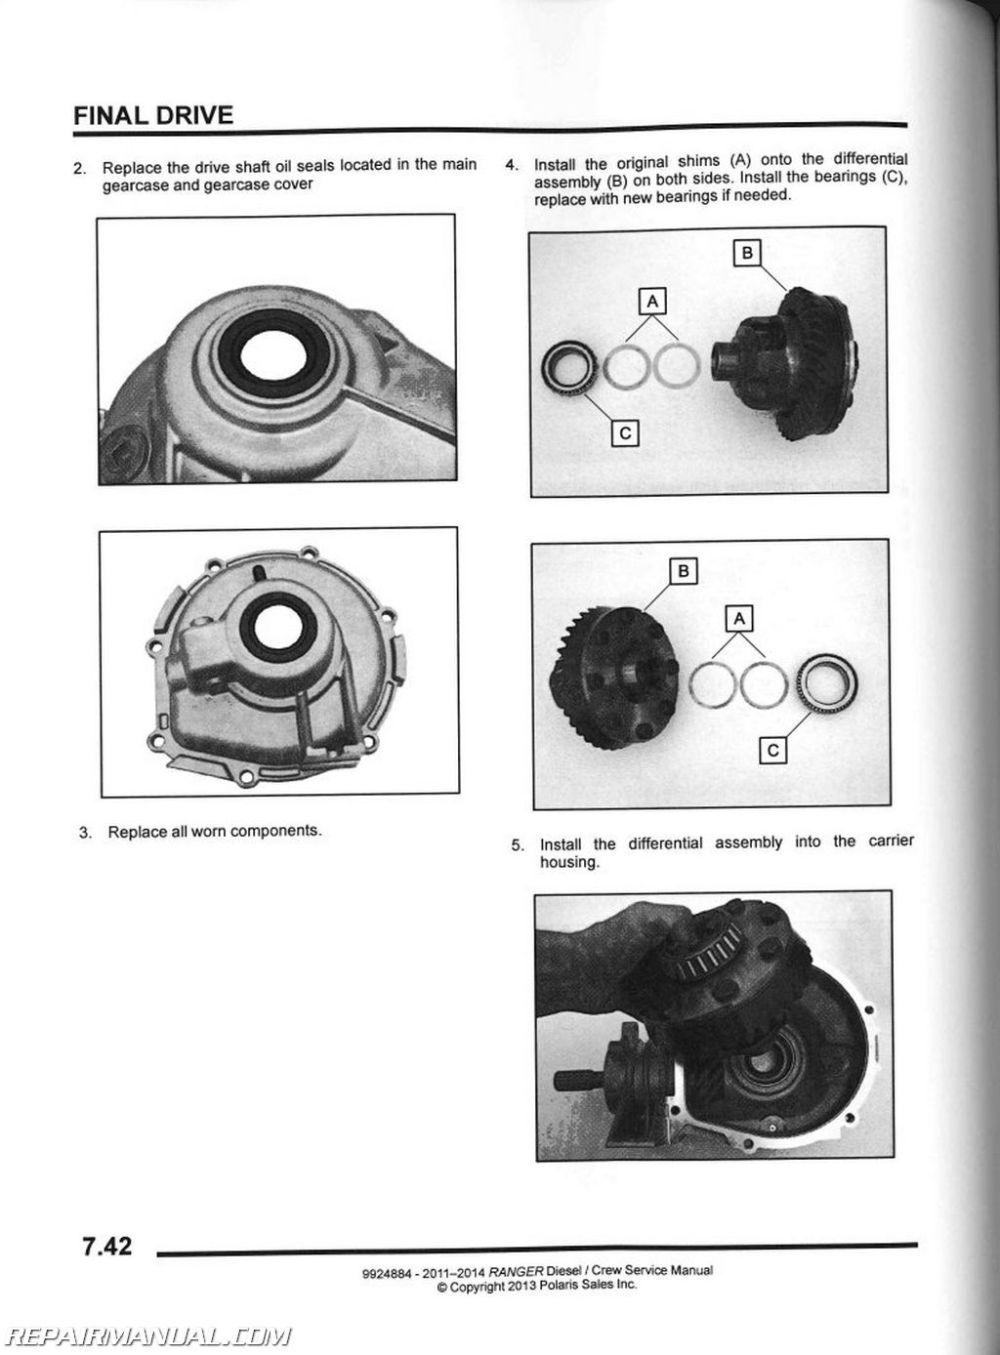 medium resolution of 2011 2014 polaris ranger diesel crew utv service manual 2012 polaris ranger crew 800 wiring diagram 2013 polaris ranger wiring schematics